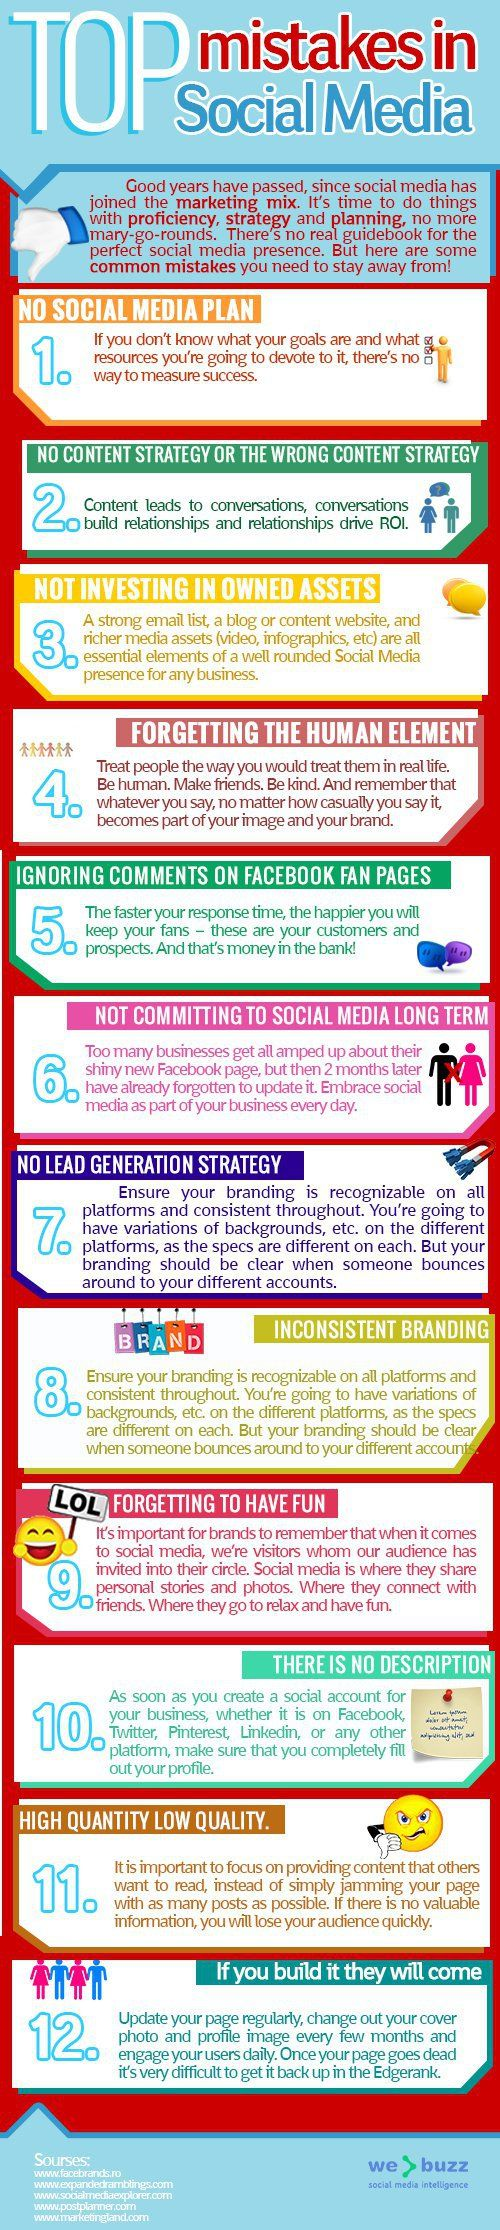 Best 20+ Marketing strategies ideas on Pinterest